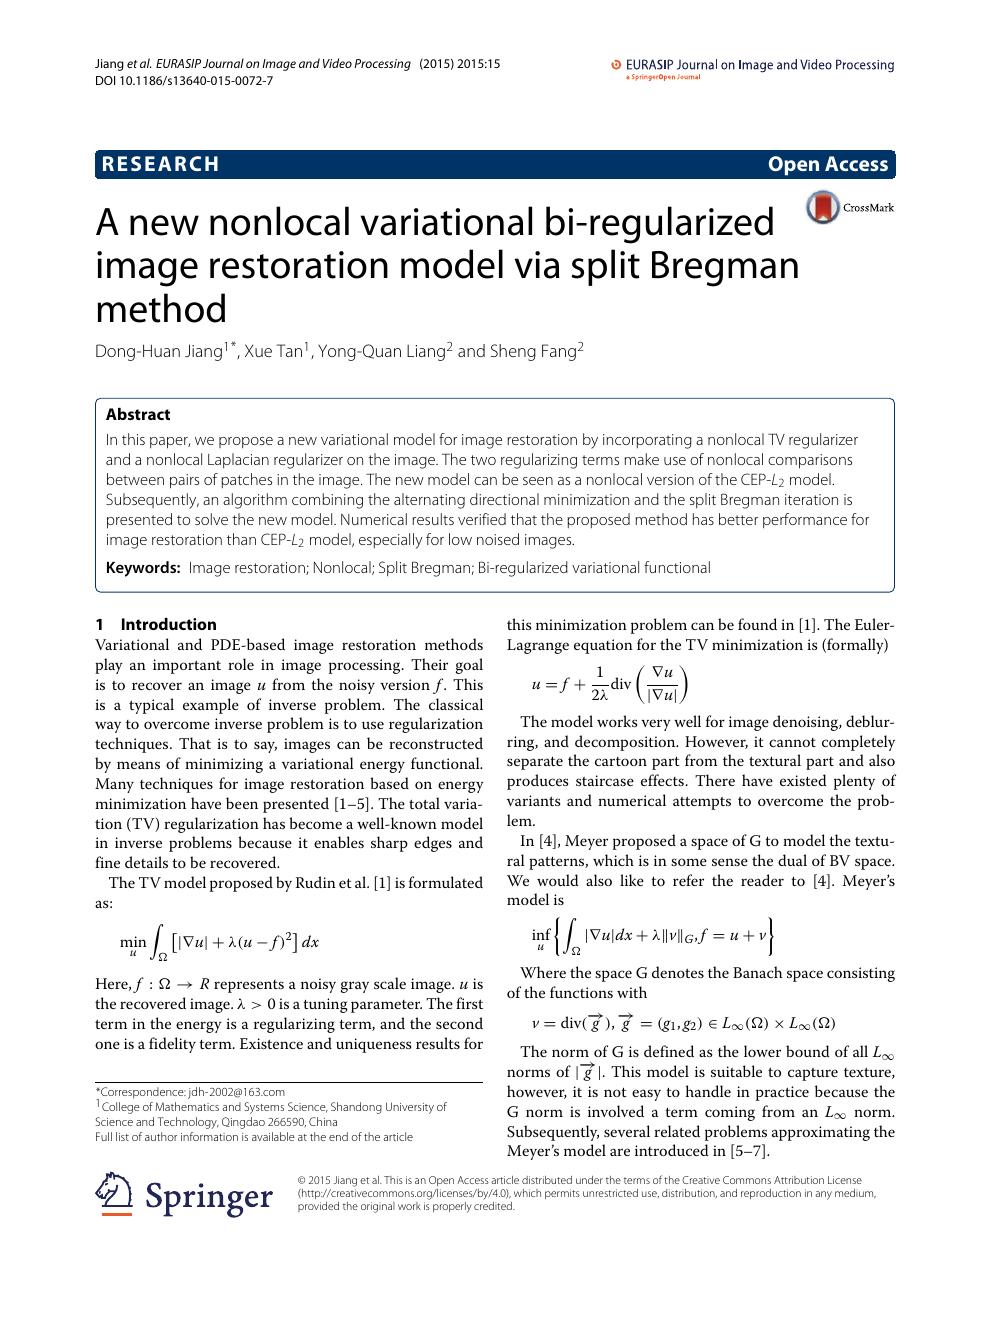 A new nonlocal variational bi-regularized image restoration model